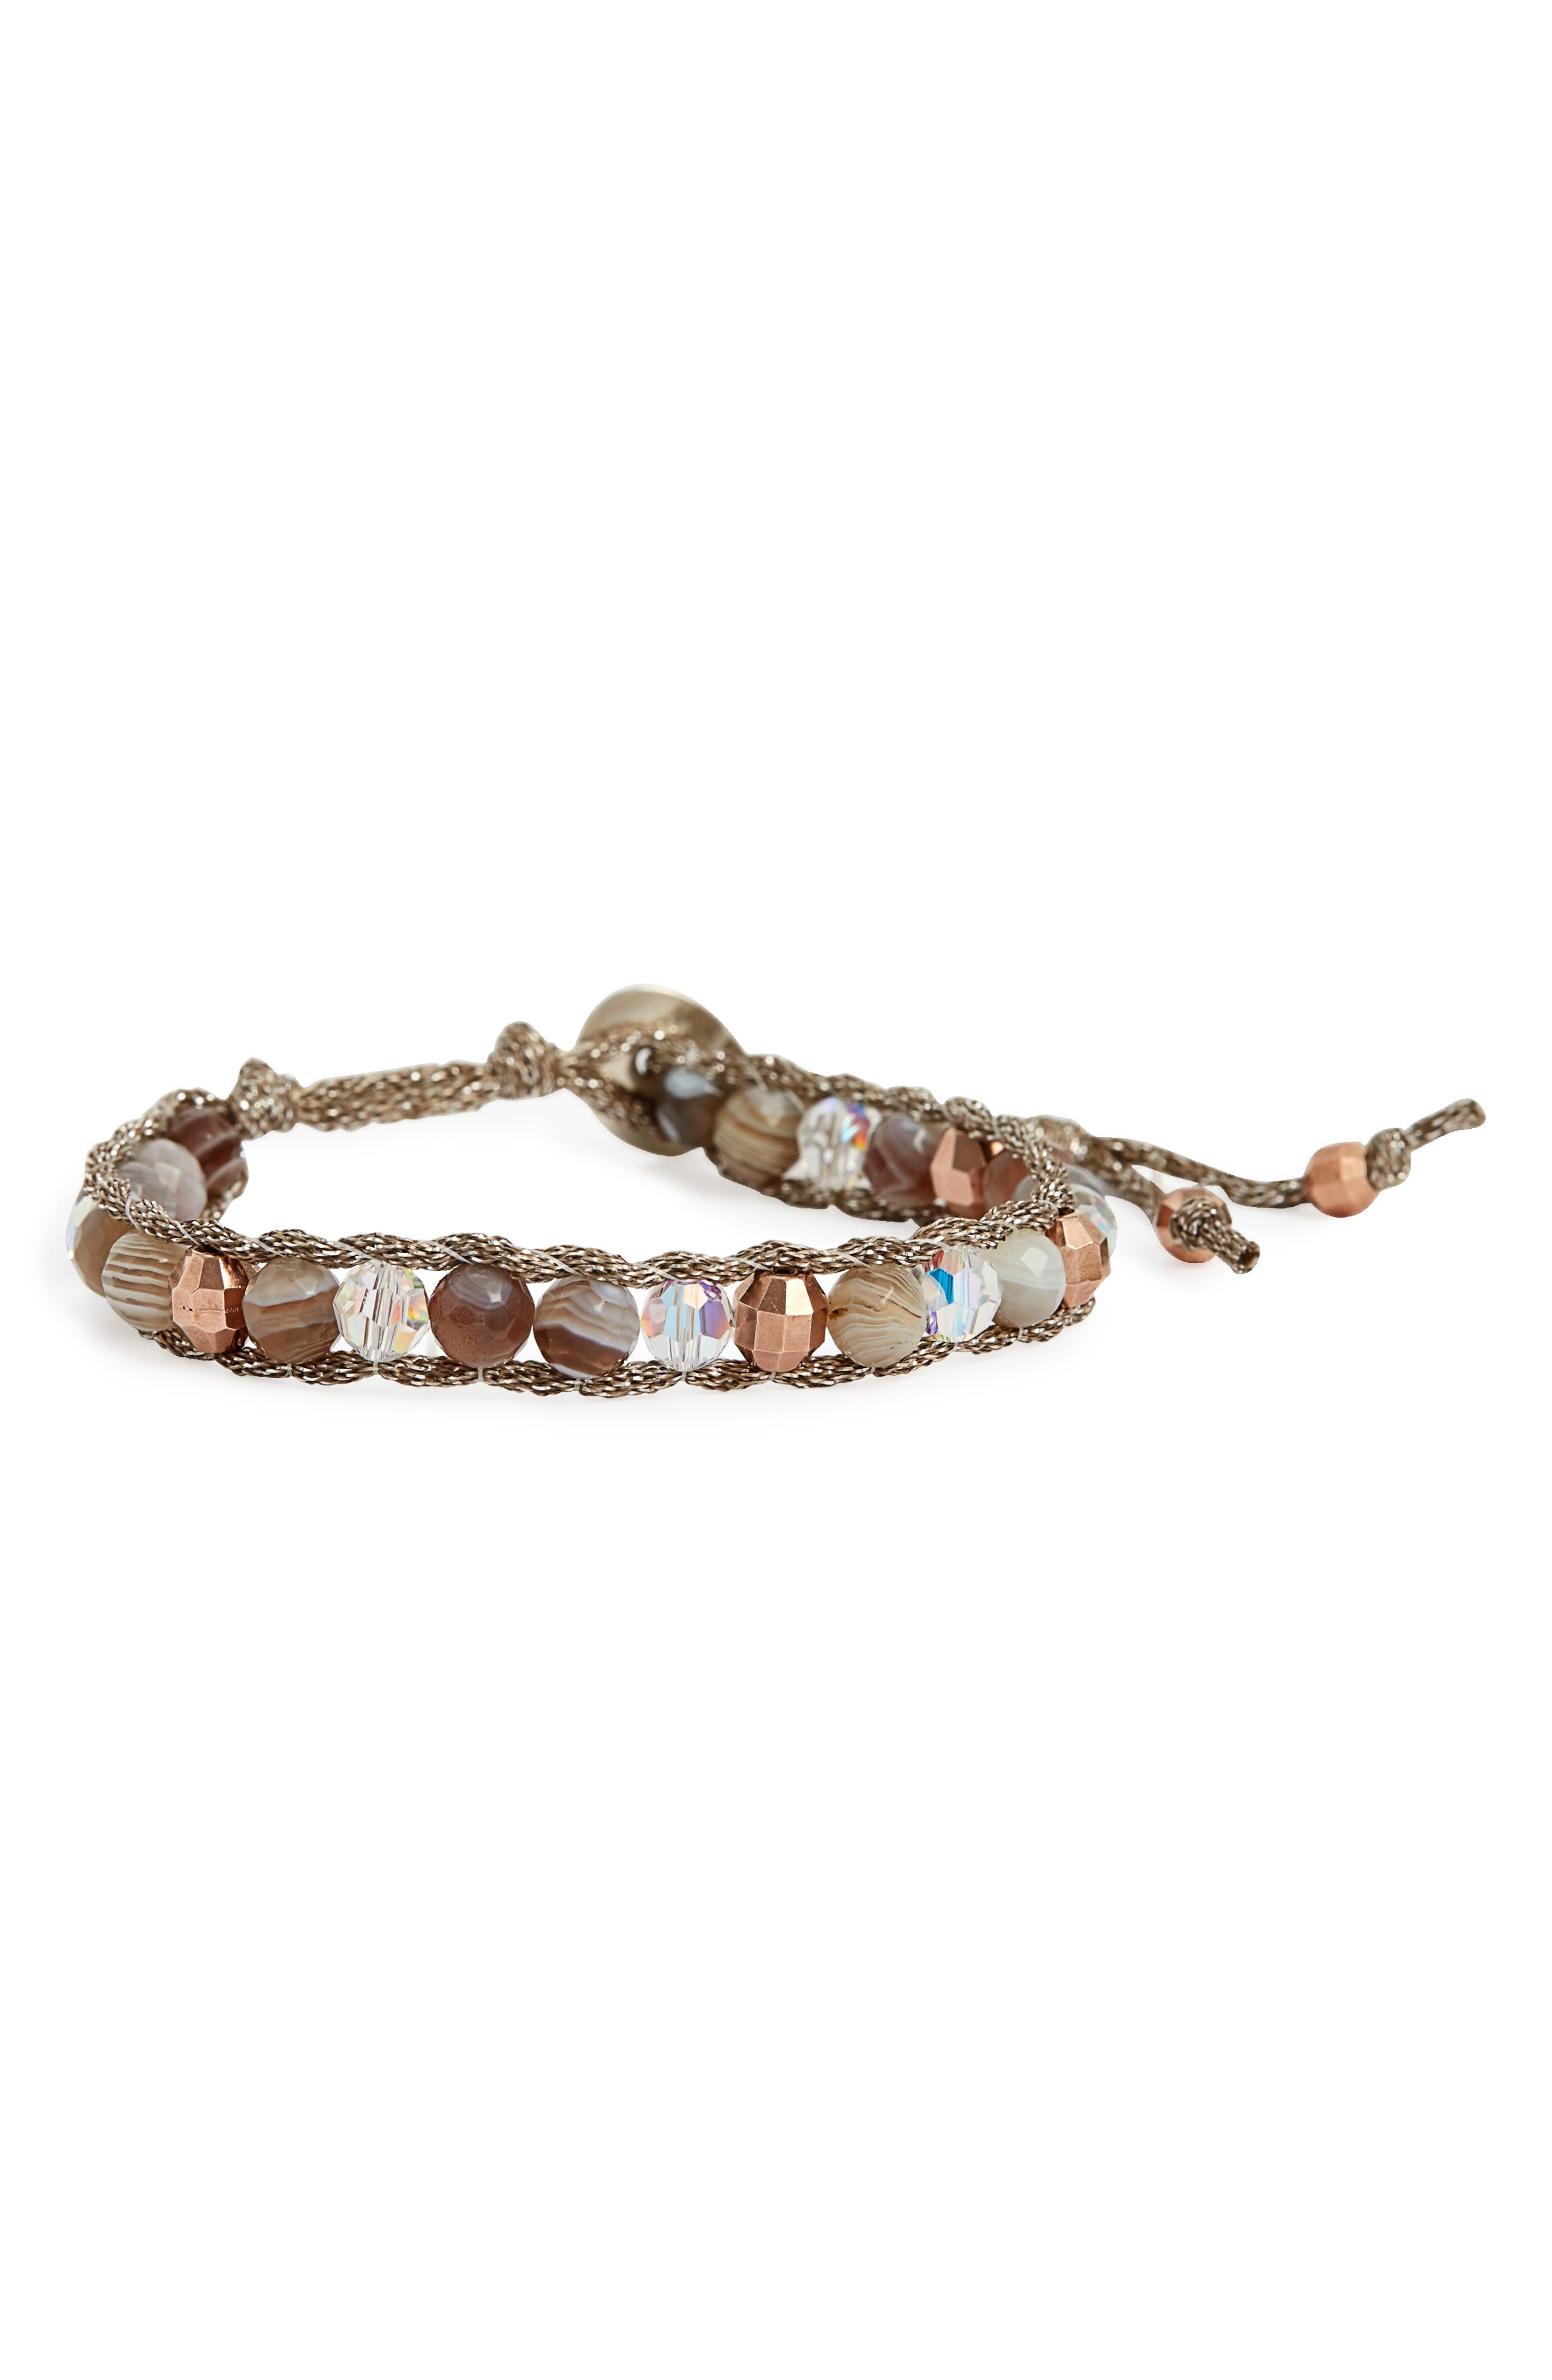 Agate & Crystal Bracelet,                         Main,                         color, Botswana Agate